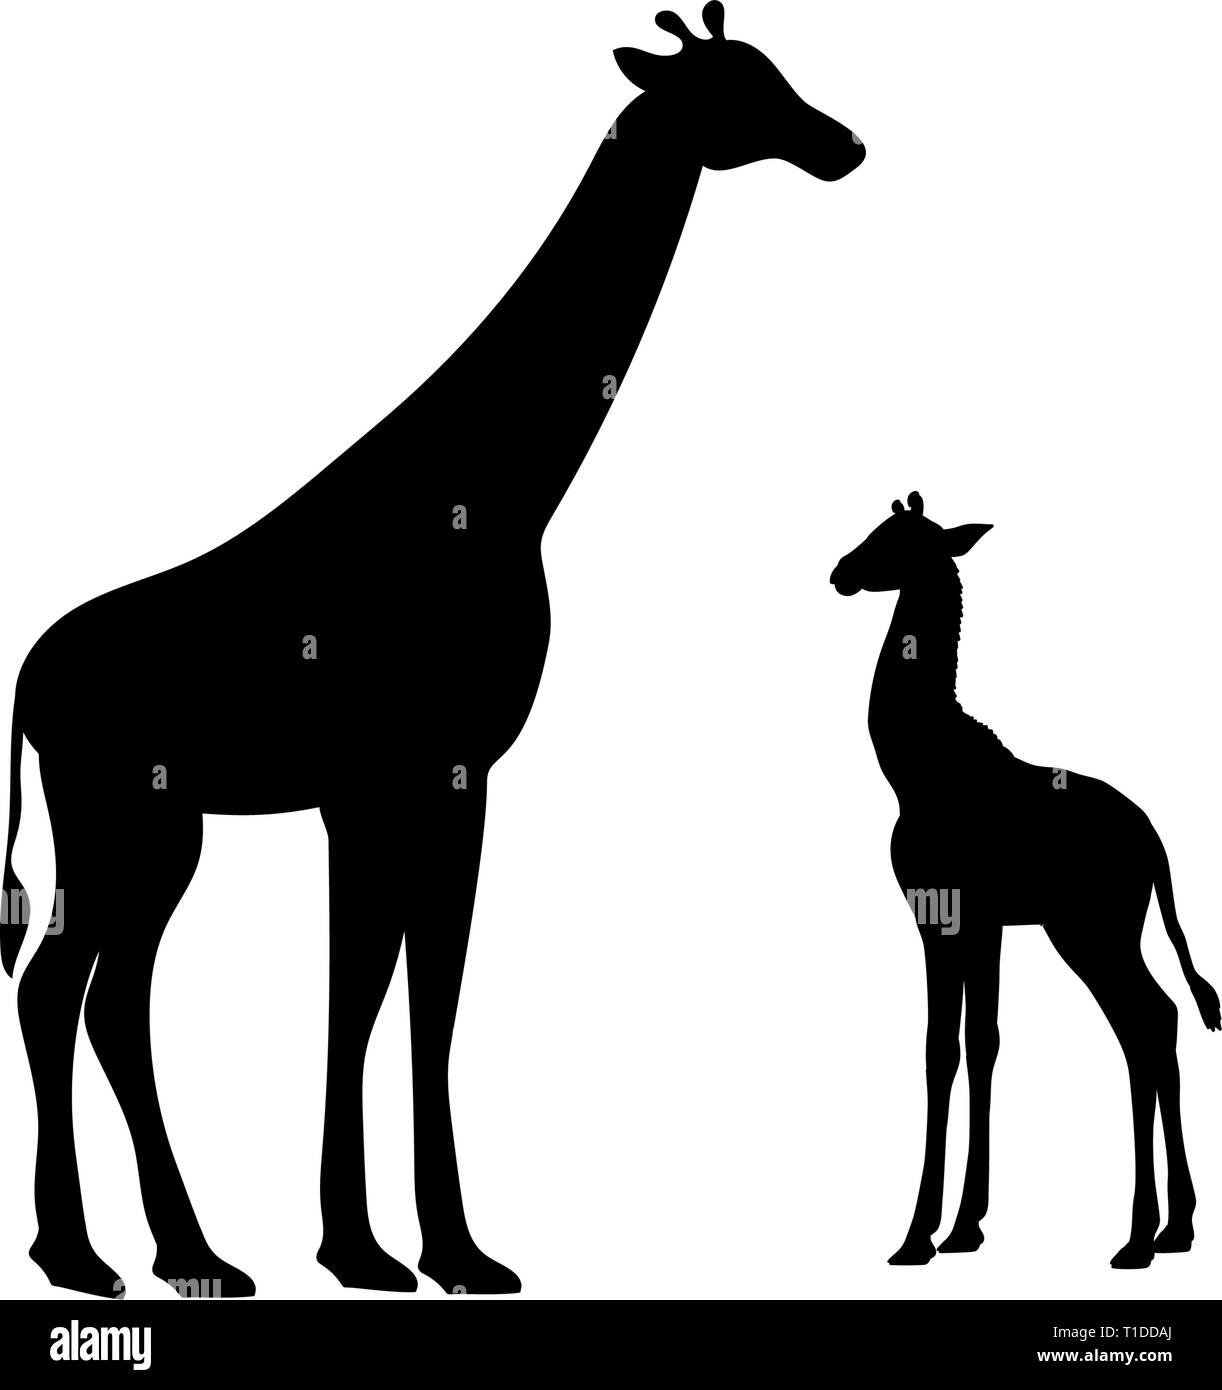 Giraffe and giraffe cub mammal silhouette animal - Stock Vector